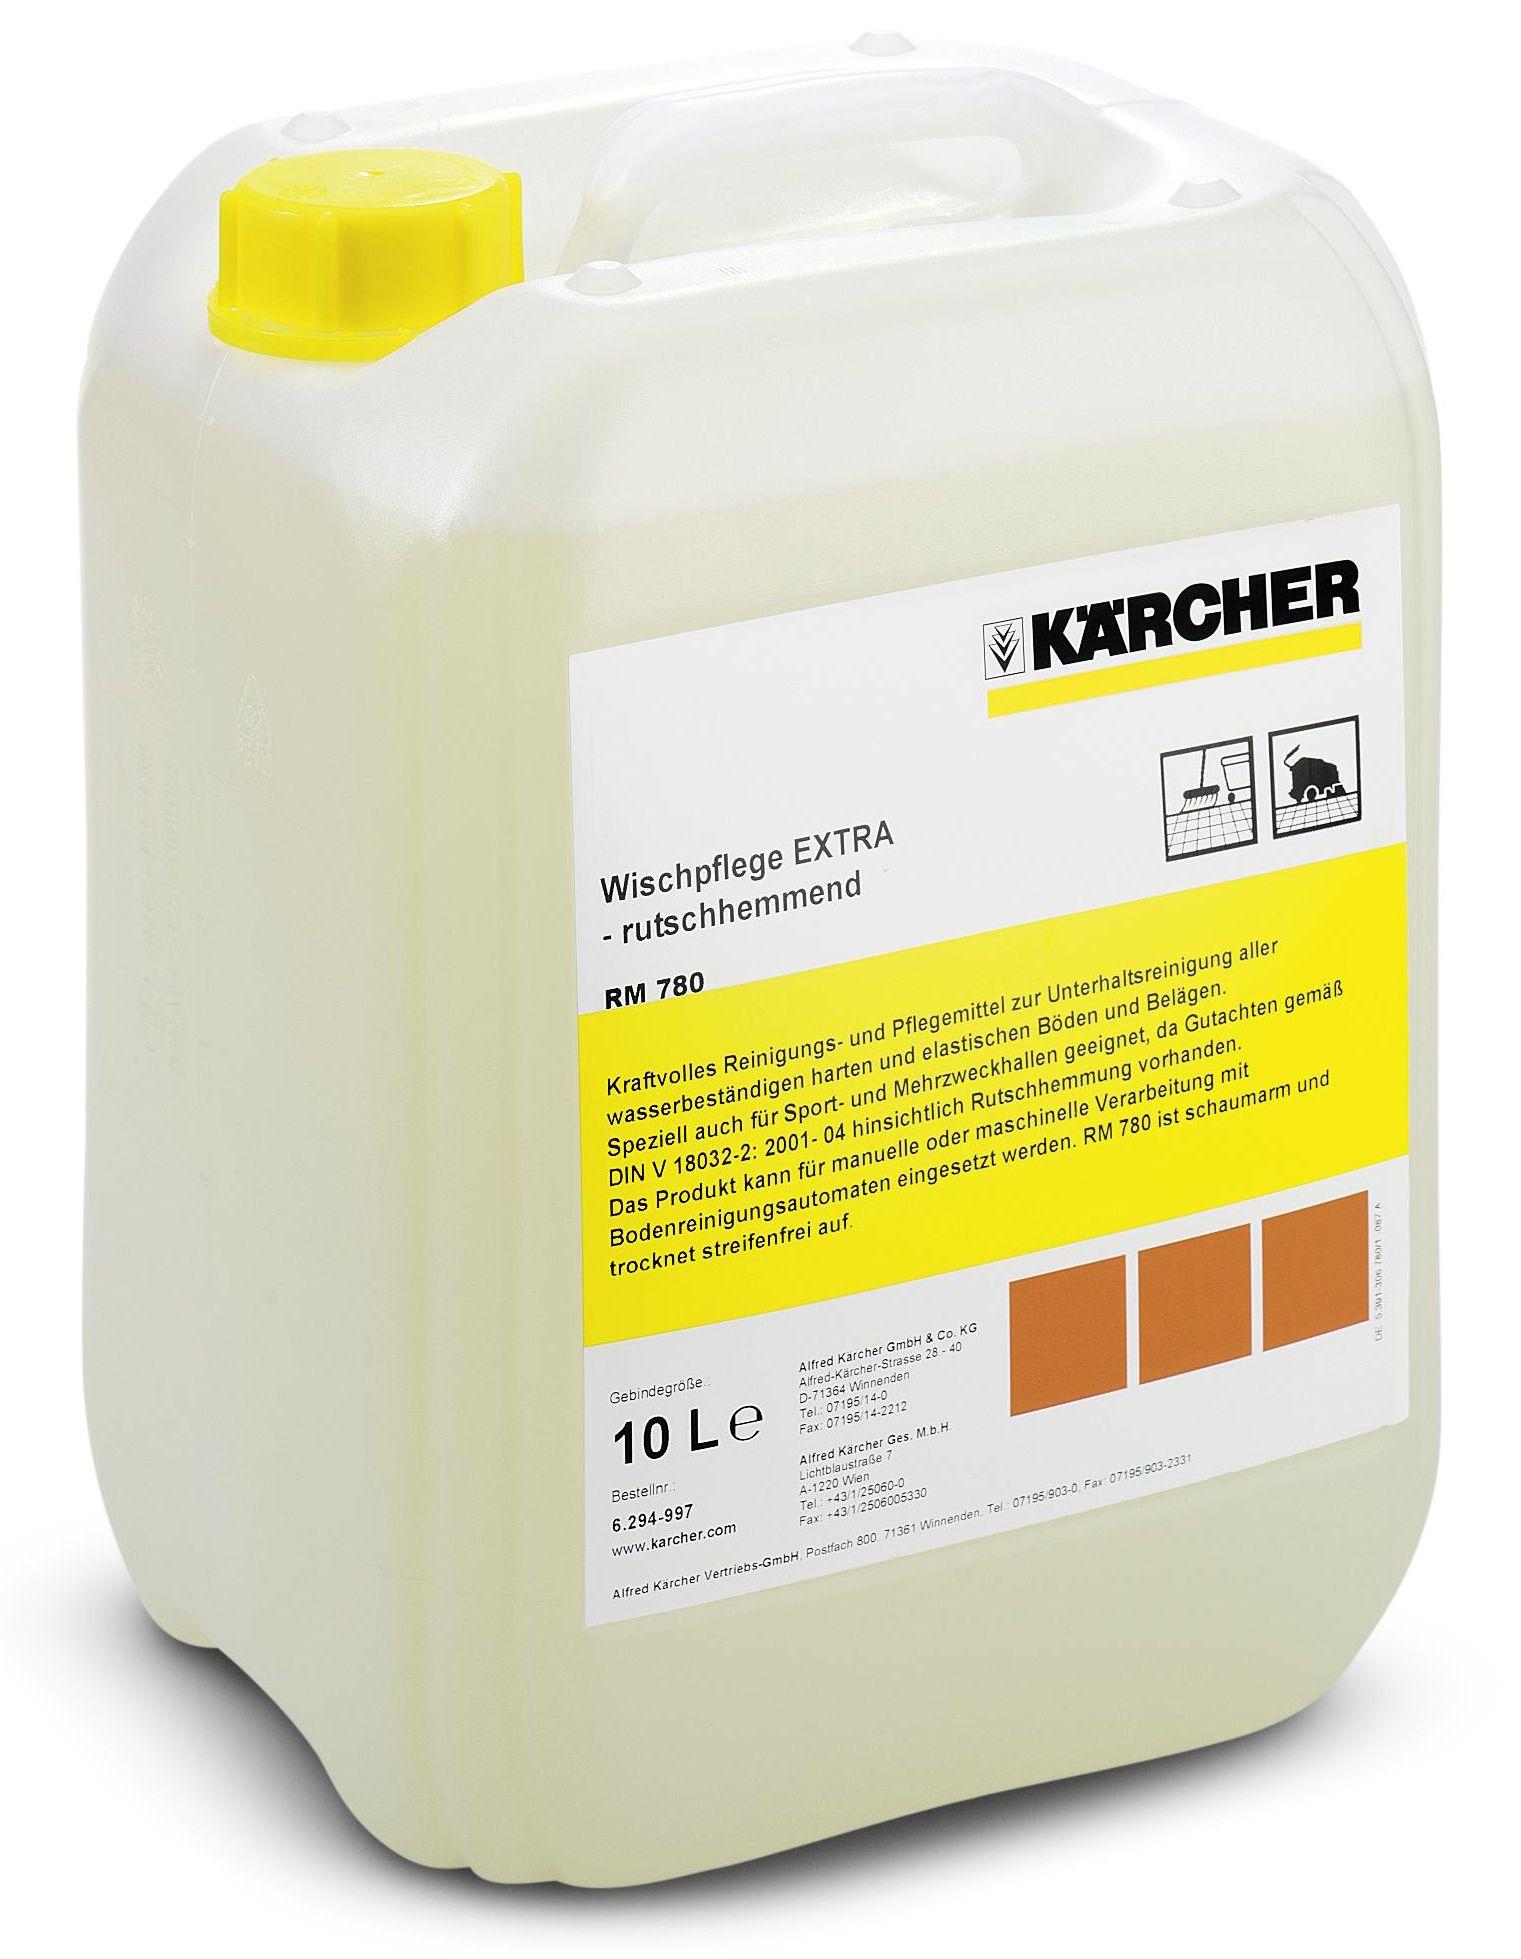 Kärcher Rengjøring RM 780 10L (flaske med 10 l) 6.294-997.0